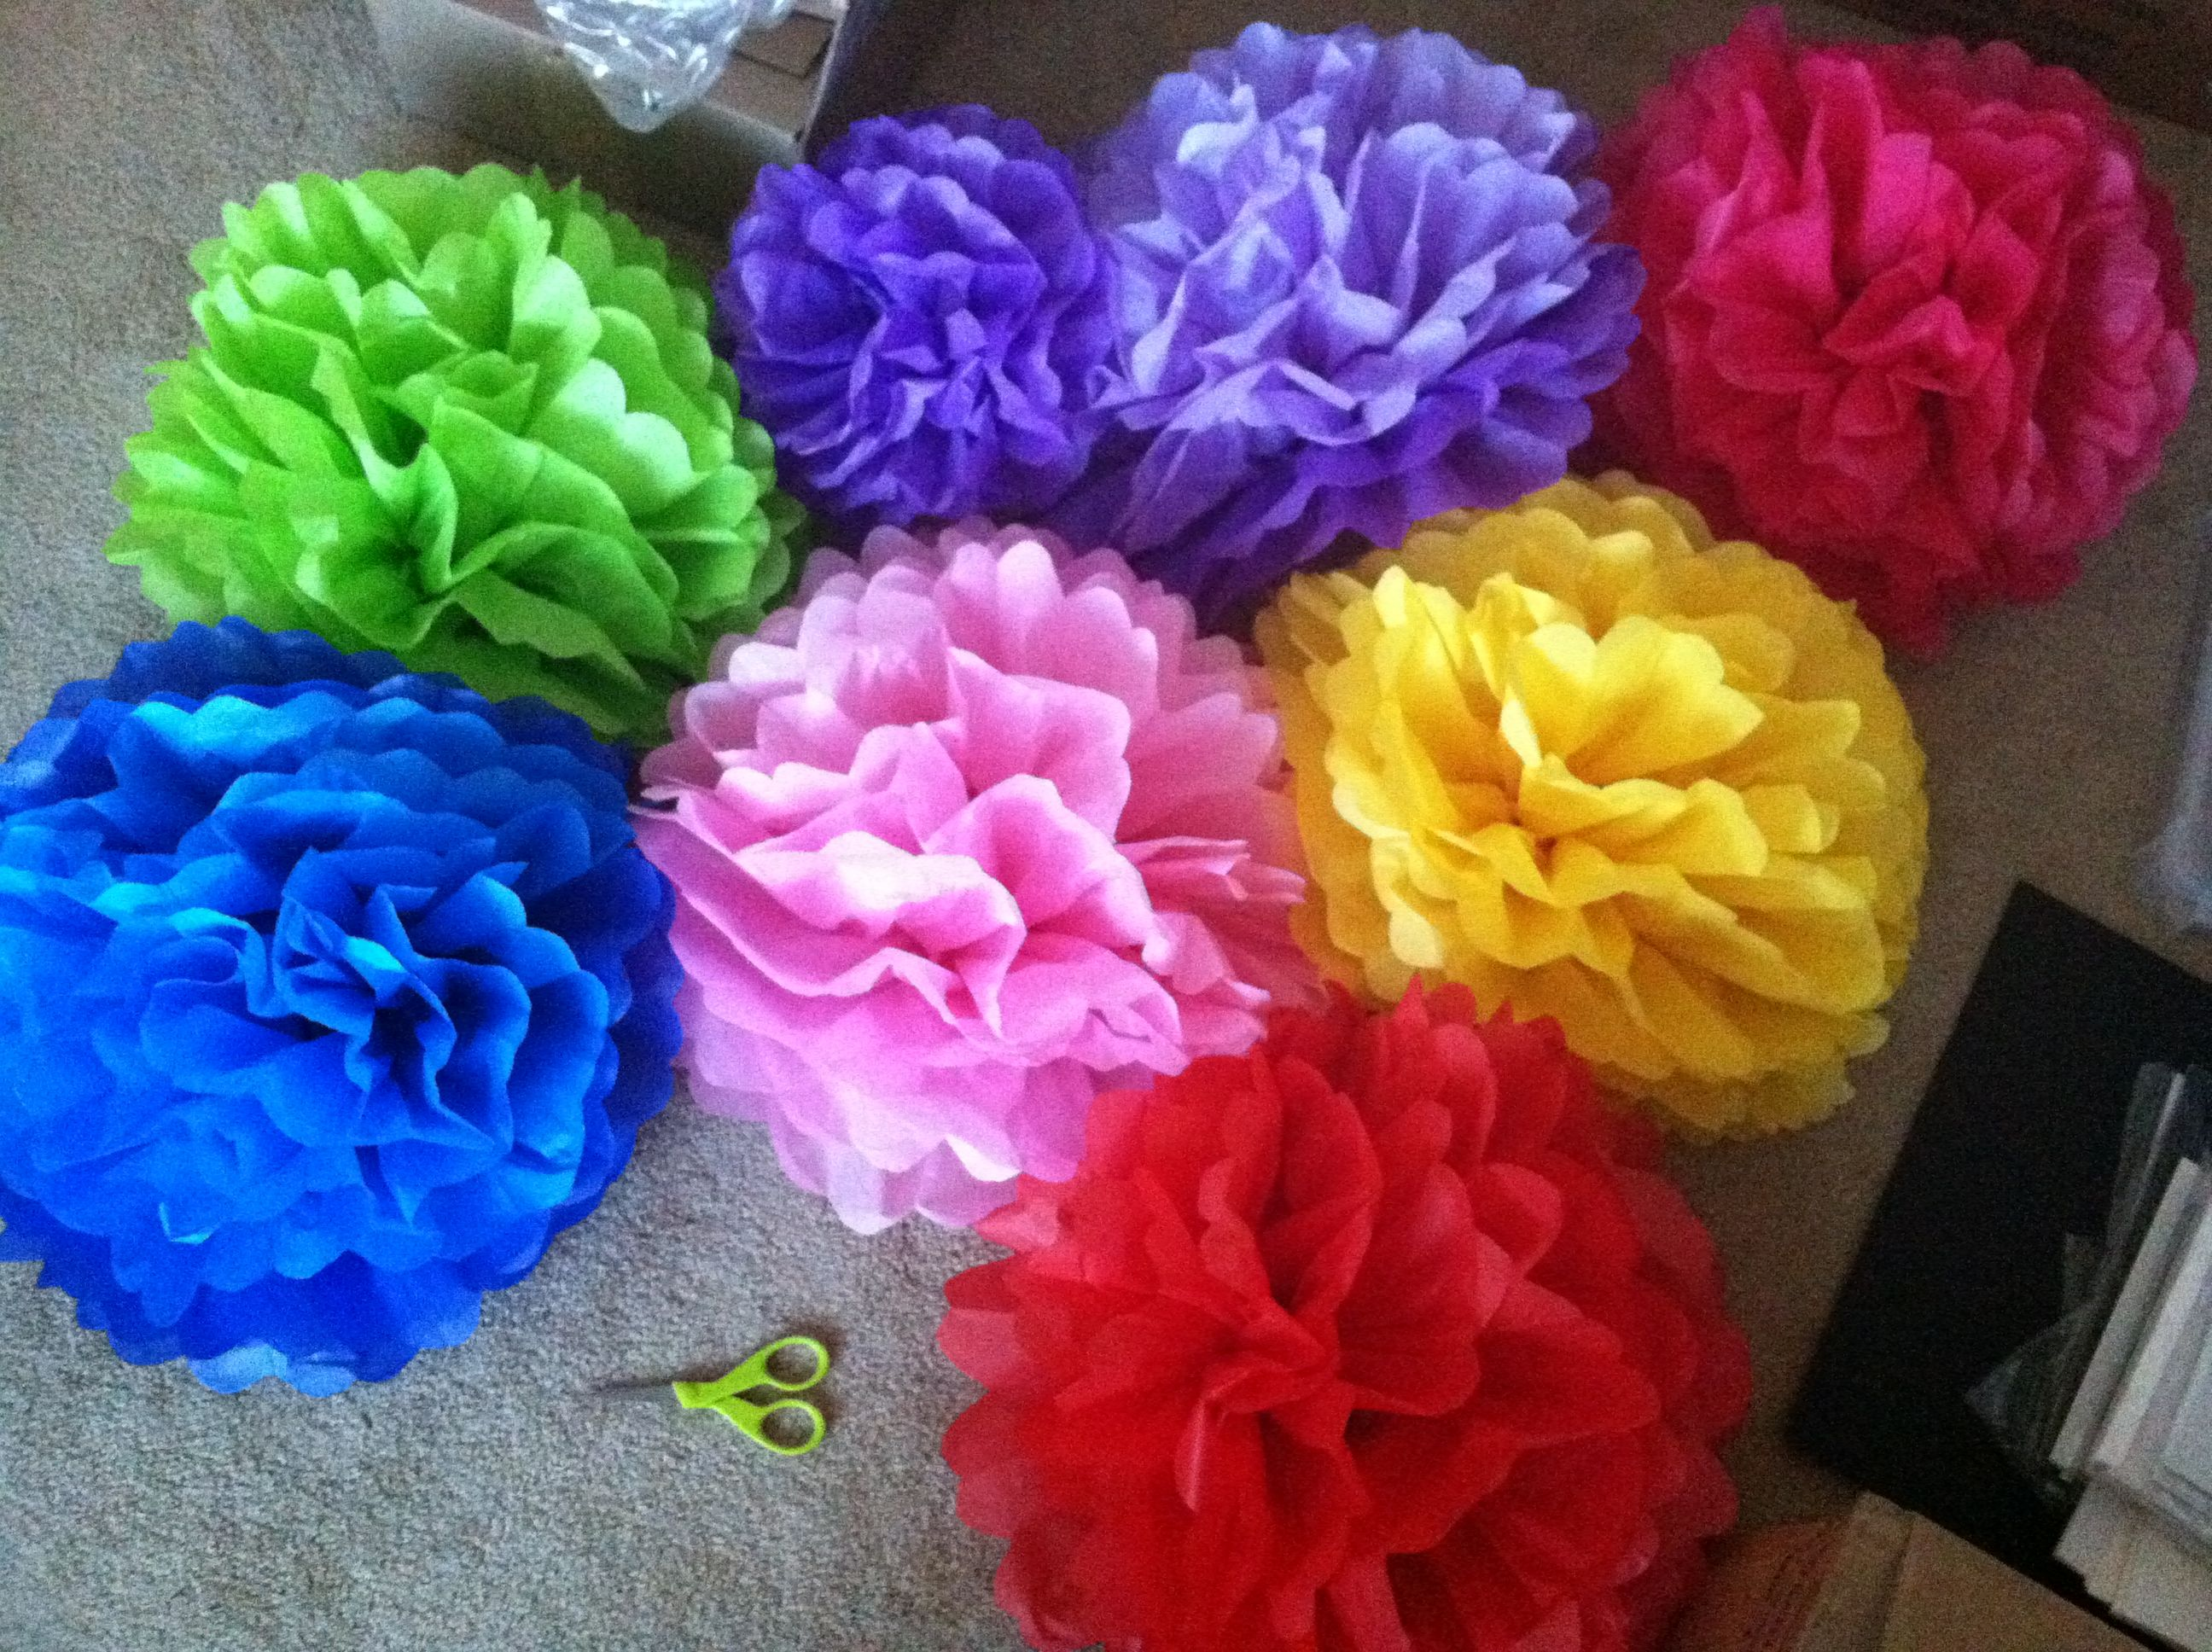 Diy Jumbo Tissue Paper Flowers Pom Poms Super Quick And Easy Now